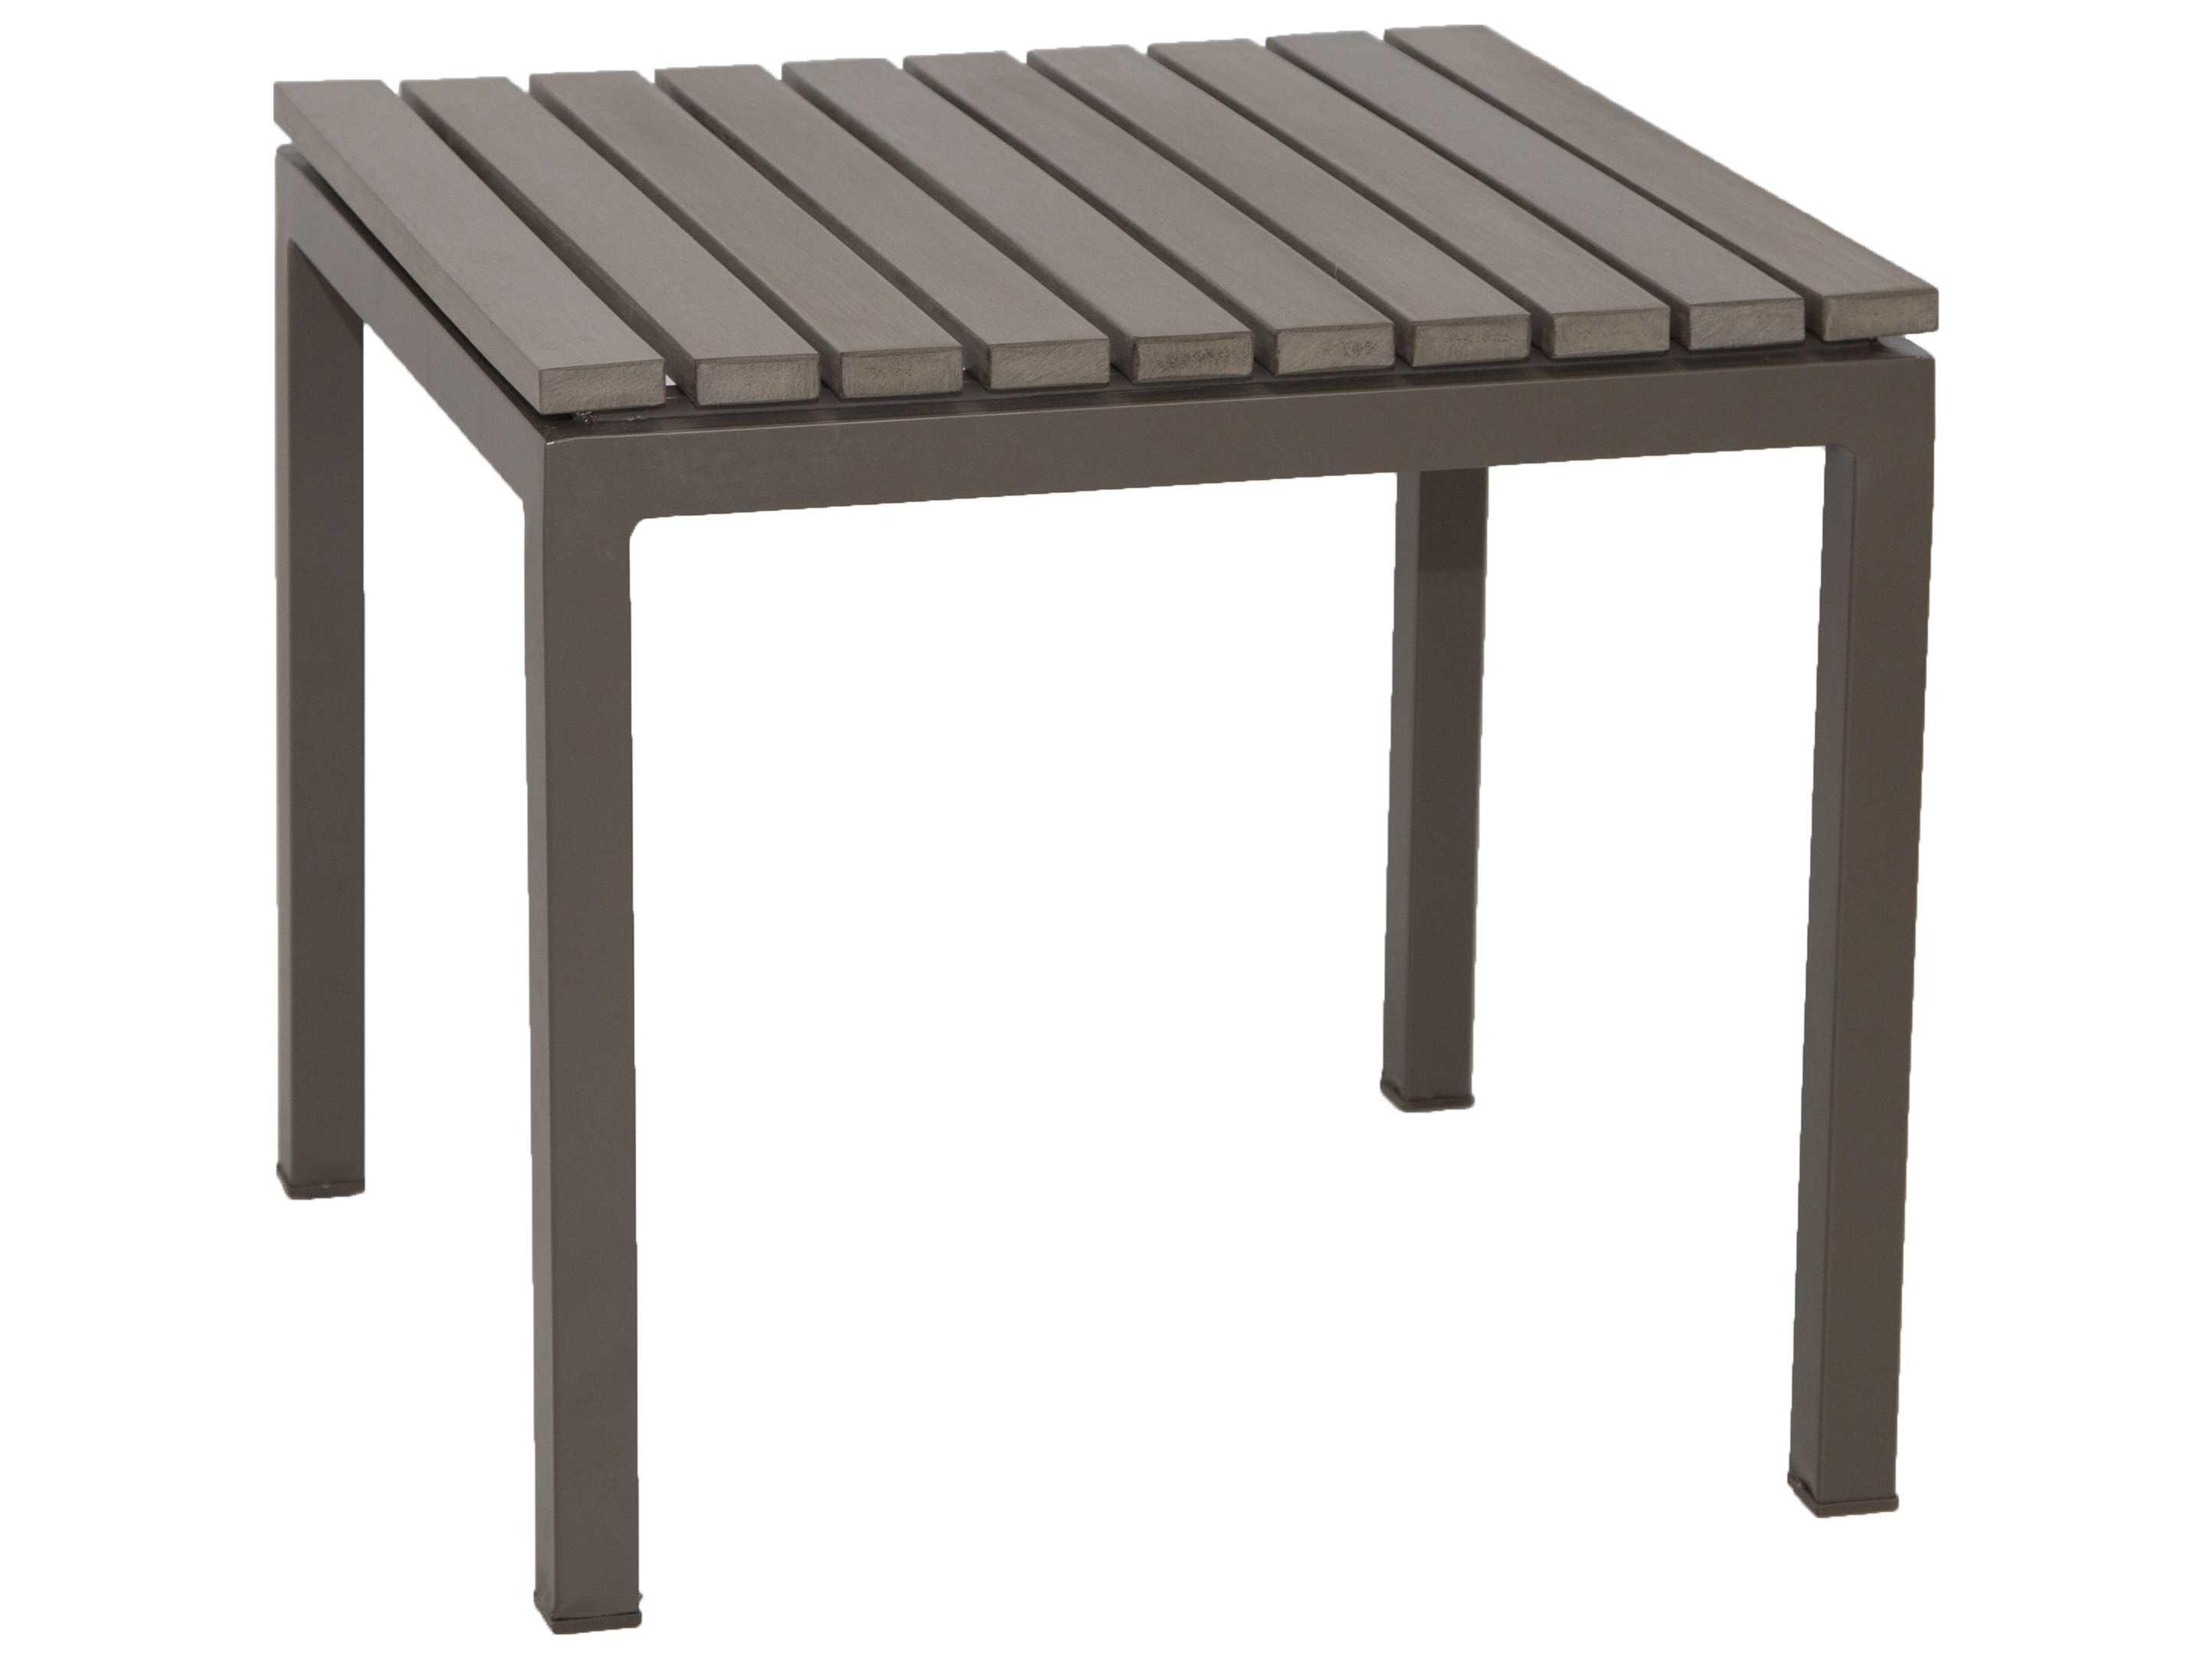 Patio heaven riviera aluminum 18 square end table tx2291 st2 for Patio heaven